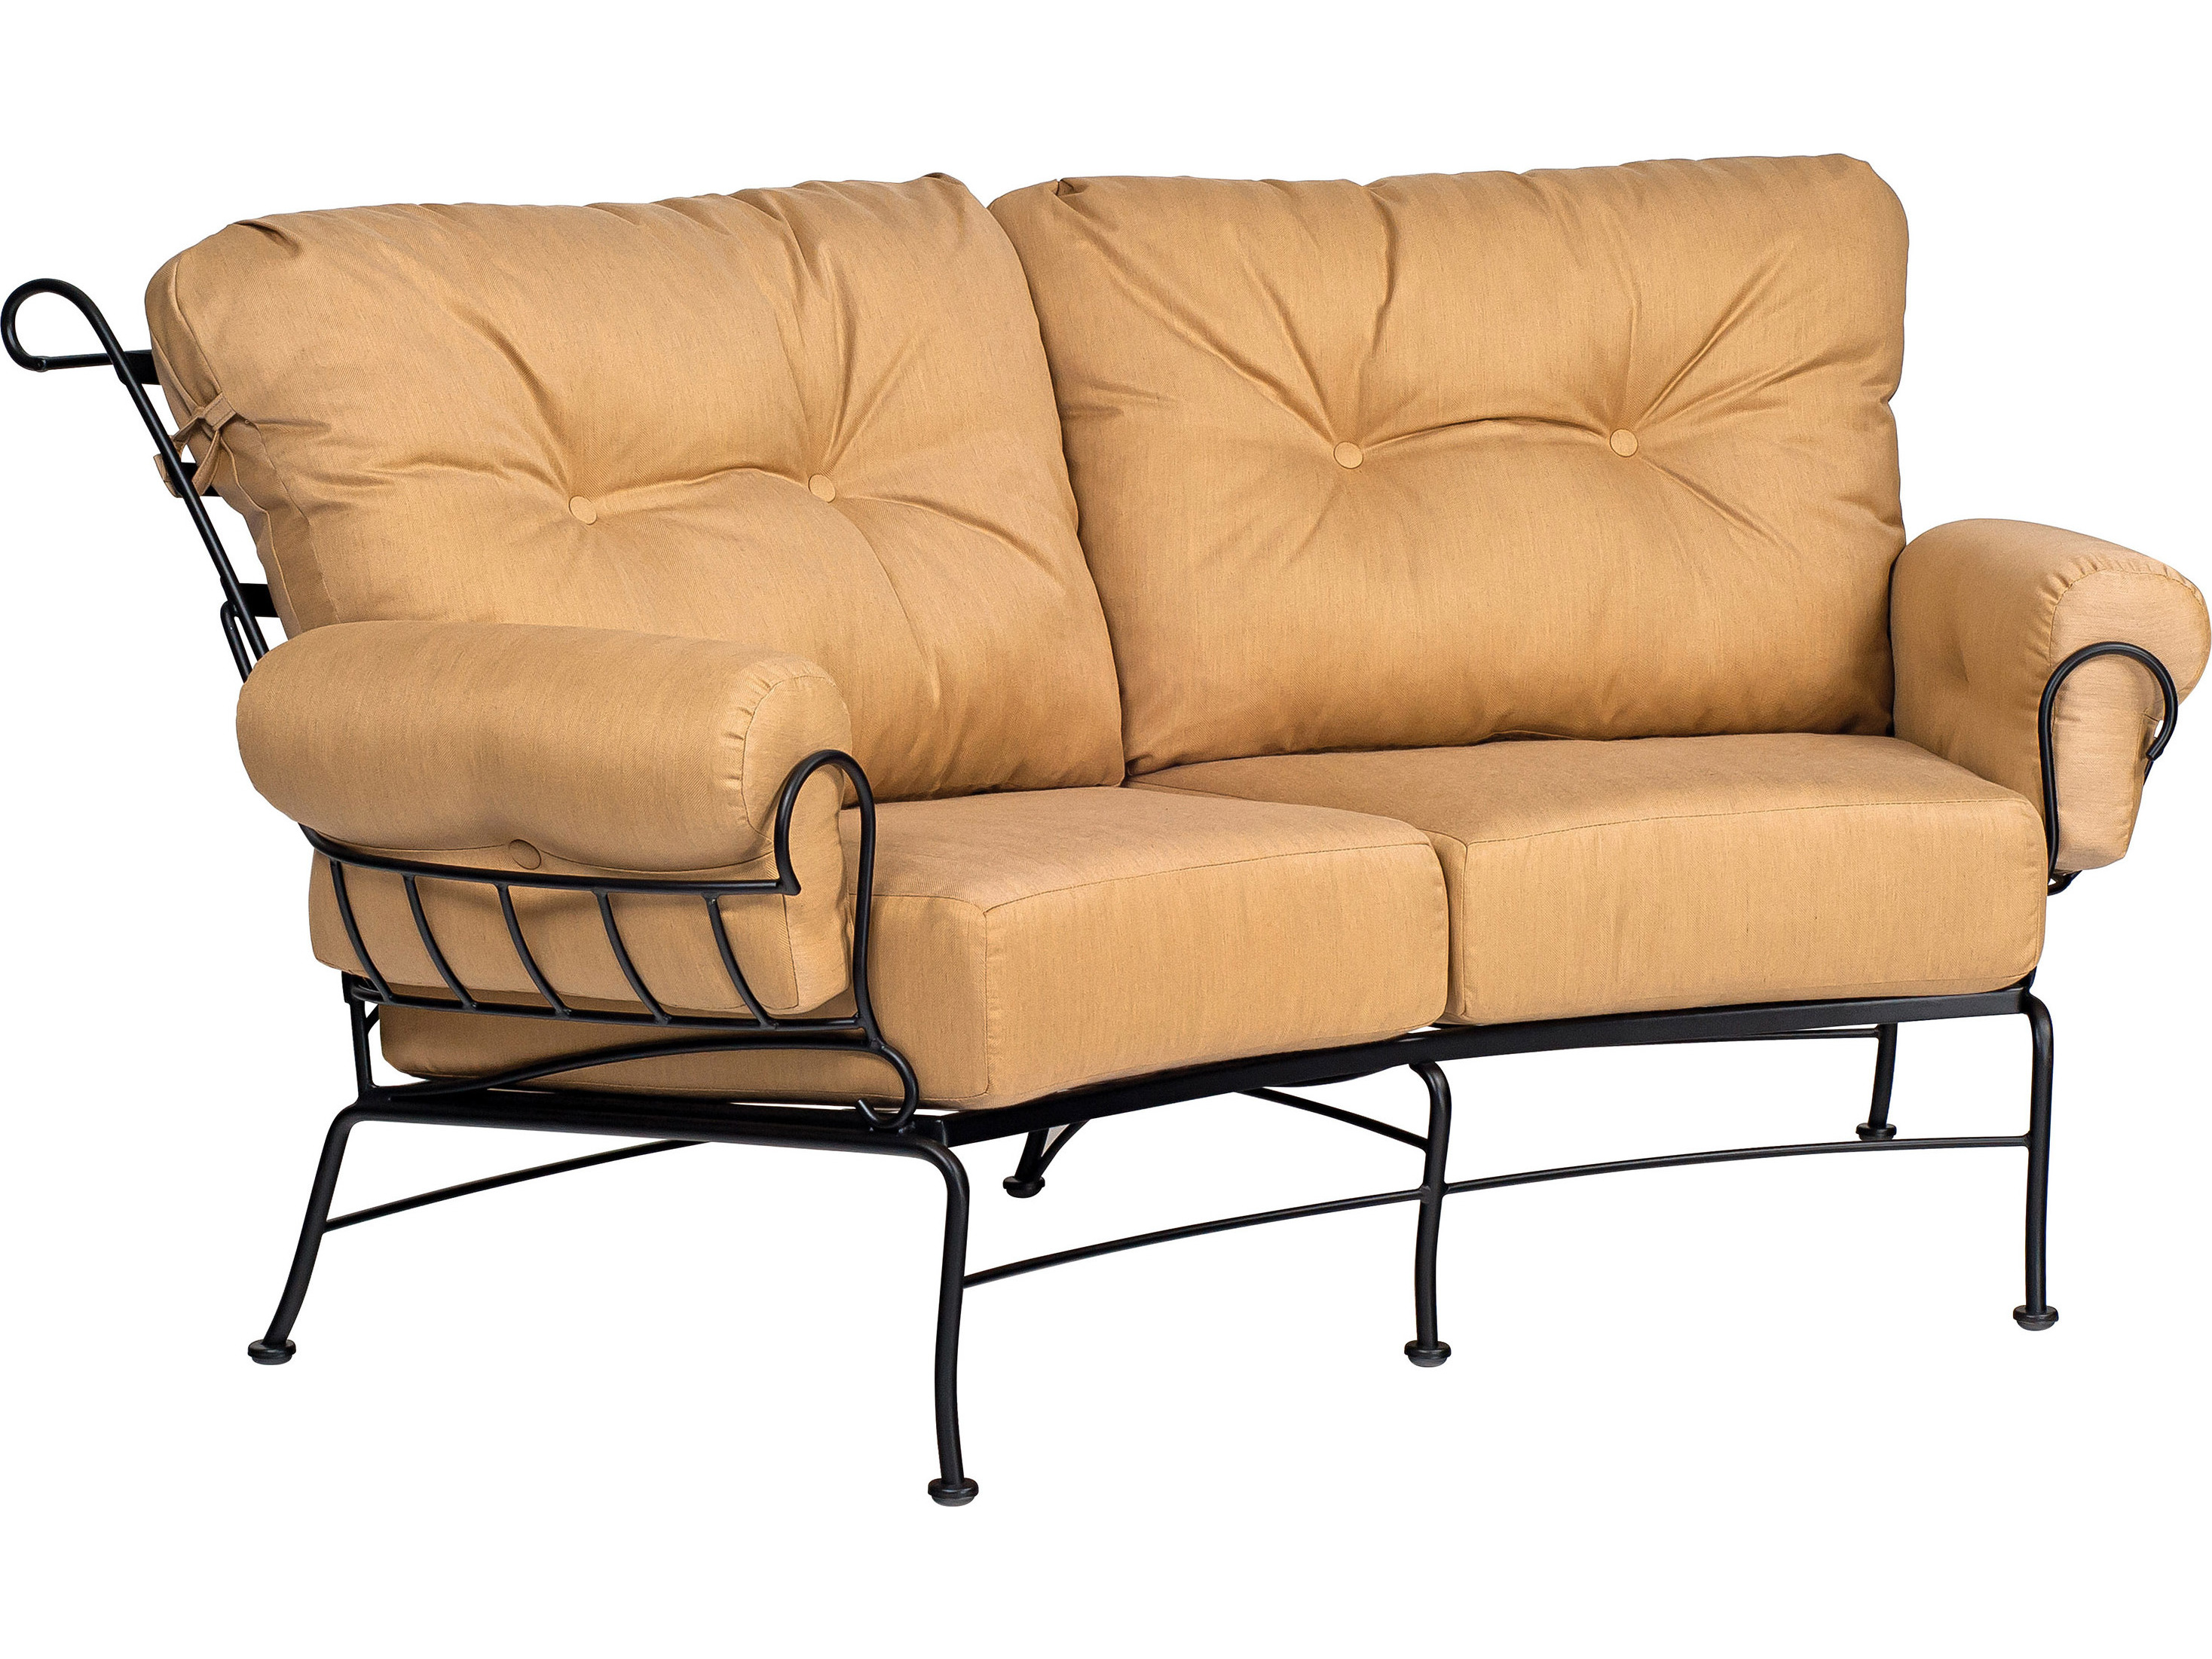 Woodard Terrace Crescent Loveseat Replacement Cushions